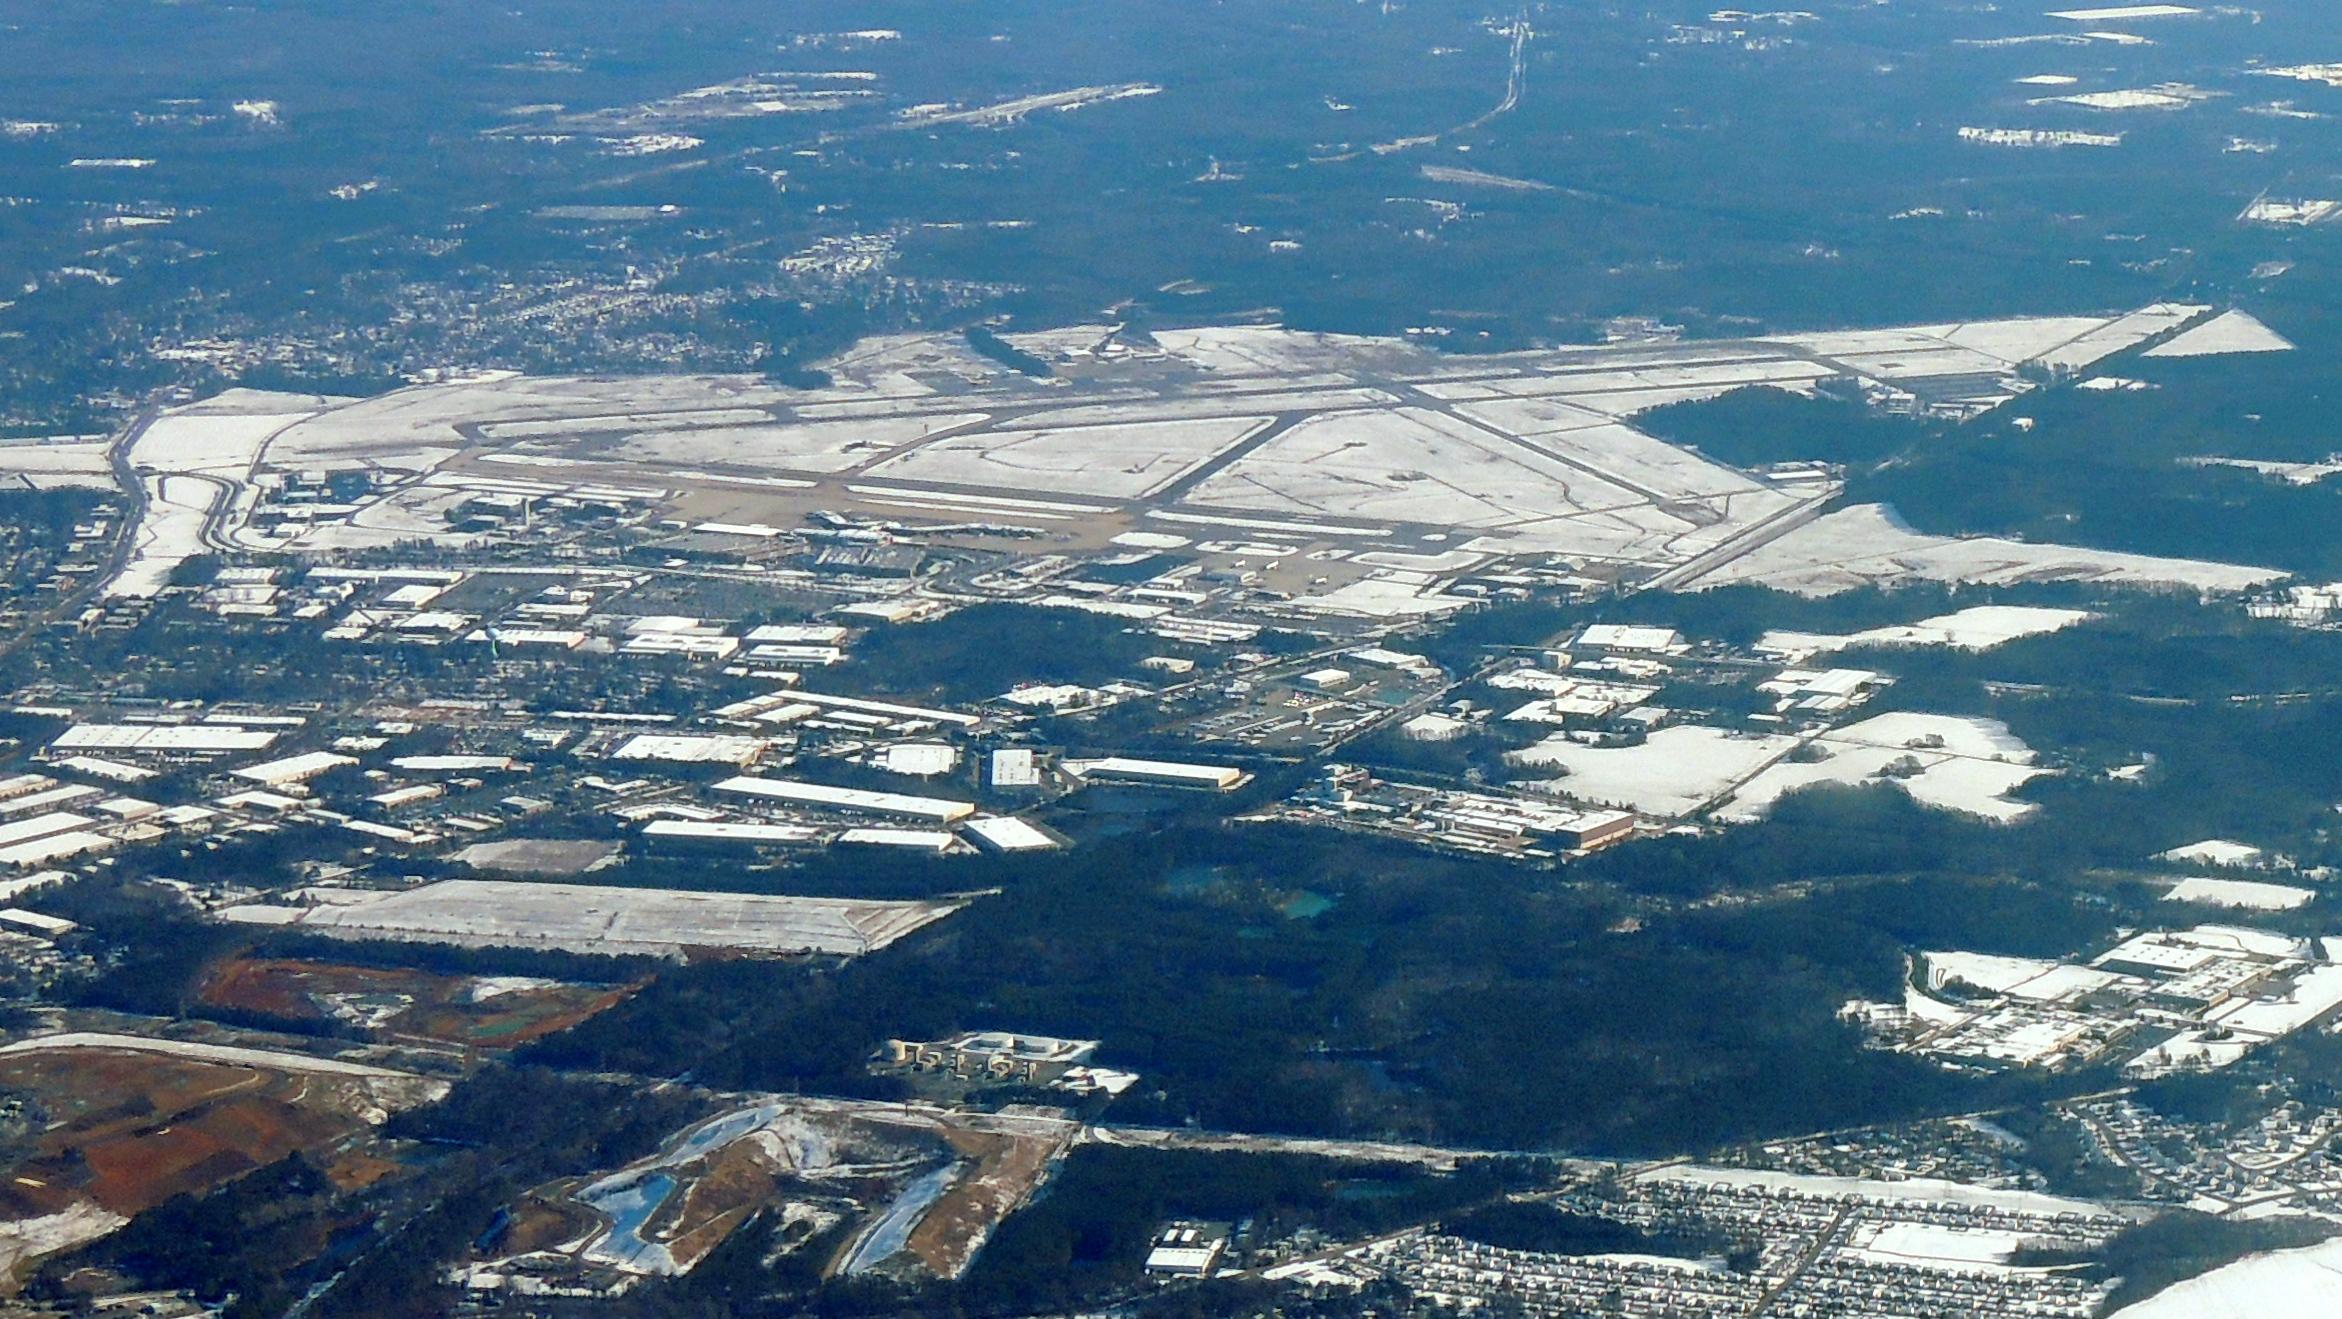 Snow on the ground at Richmond International (RIC)